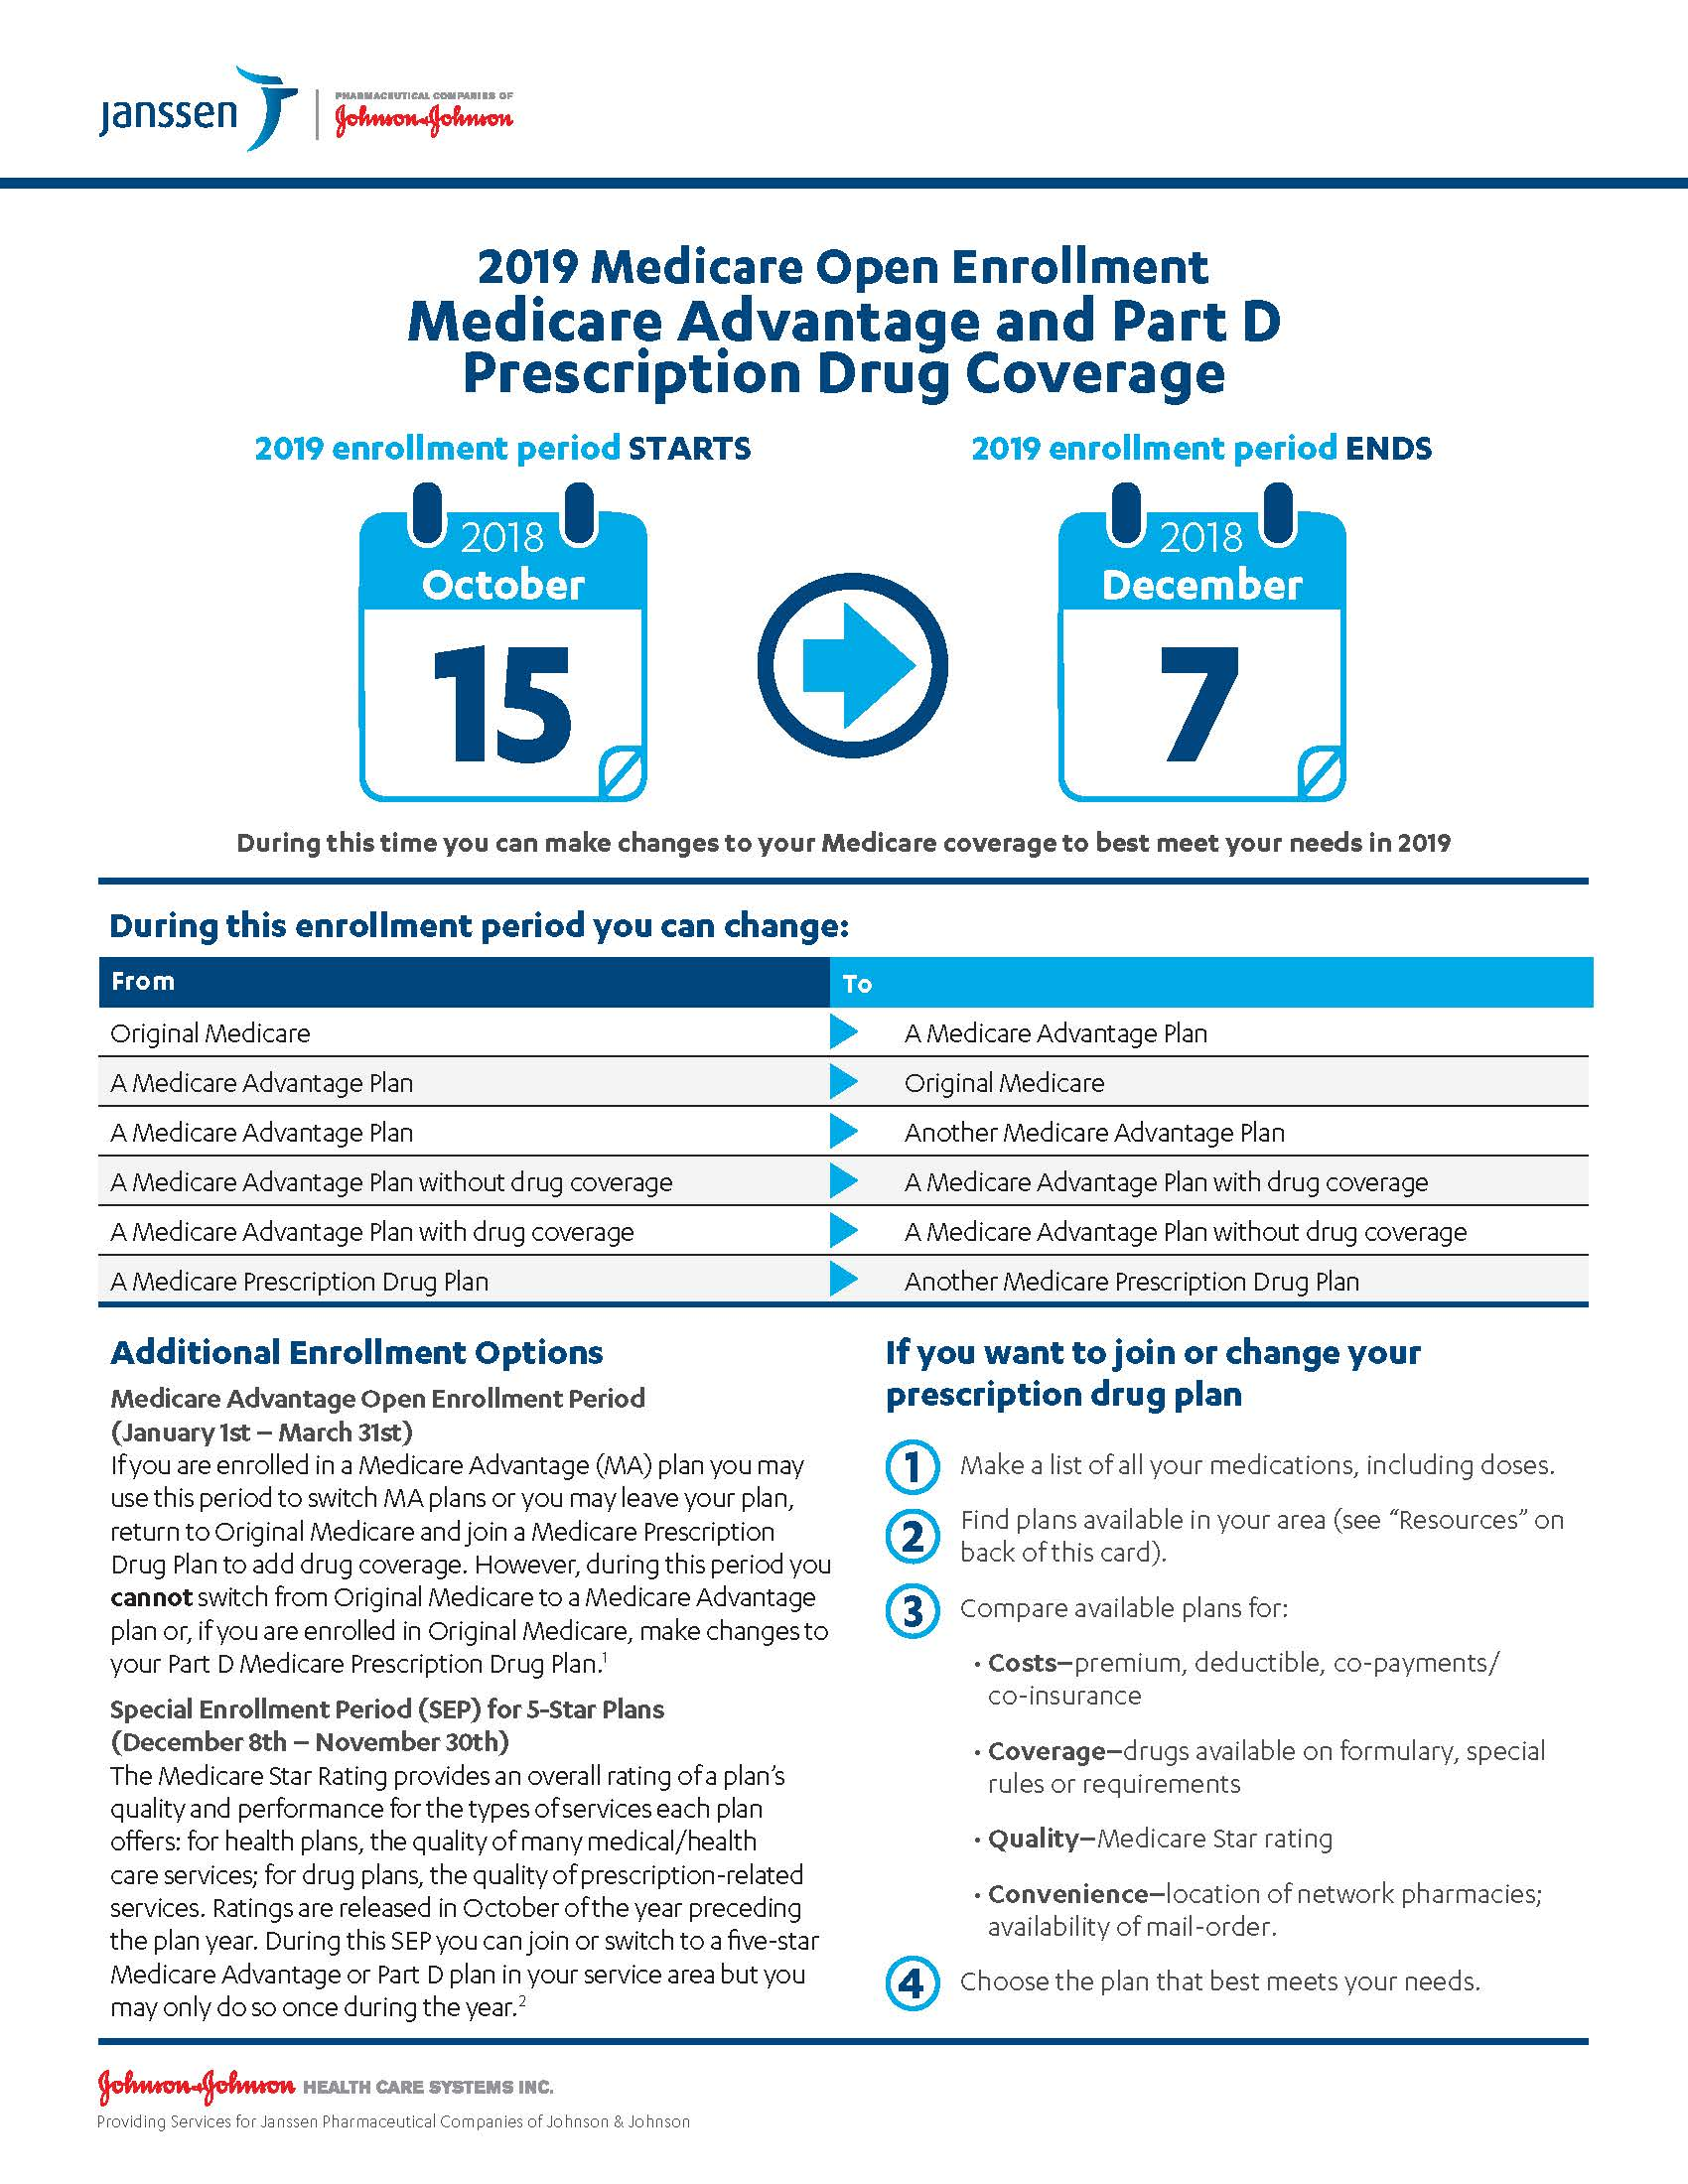 2019 Medicare Open Enrollment Medicare Advantage and Part D